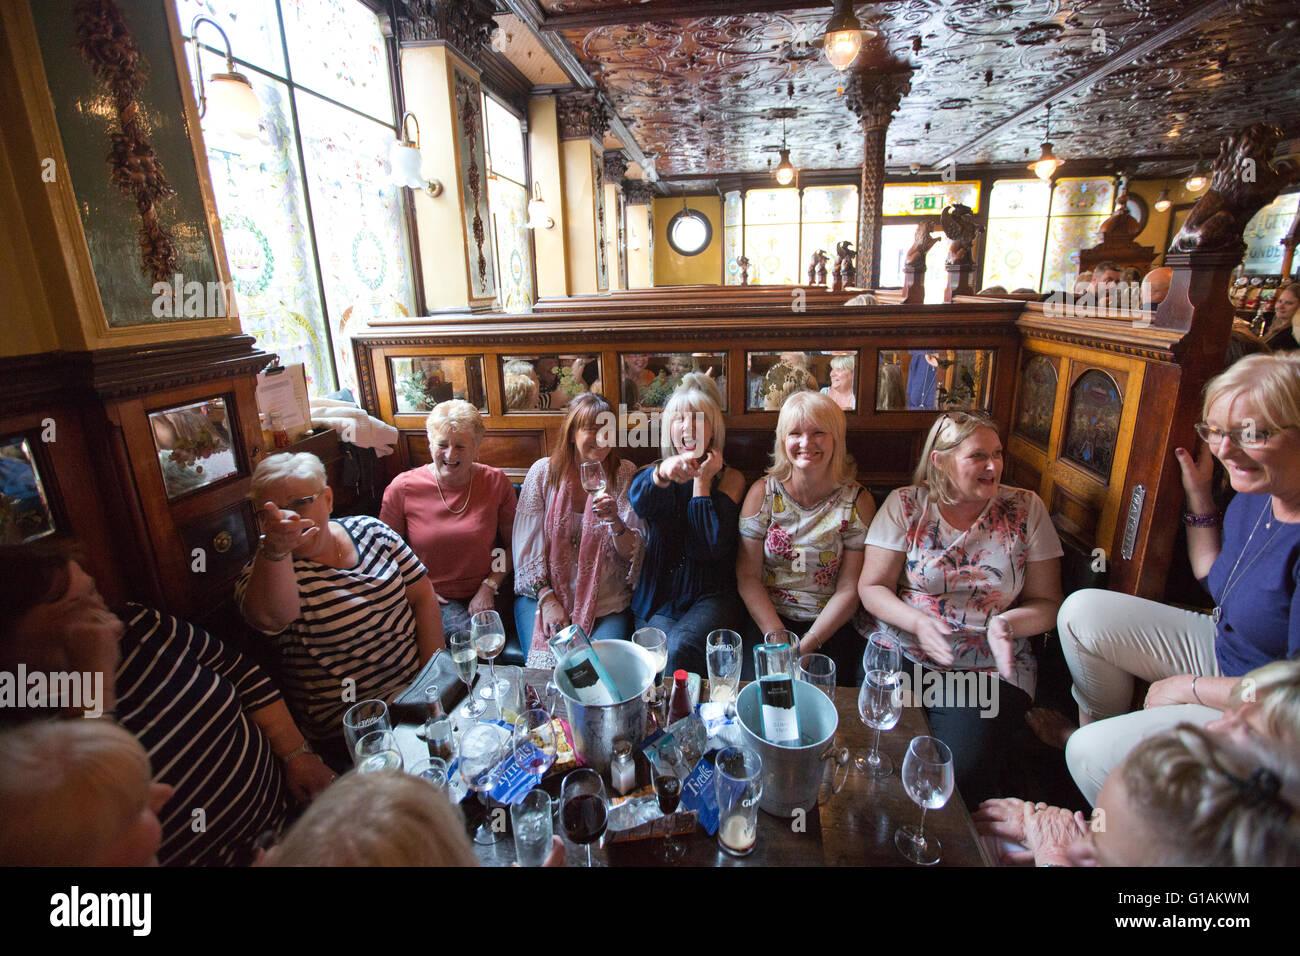 The Crown Liquor Saloon, Victorian gin palace and liquor saloon bar, Great Victoria Street, Belfast, Northern Ireland. - Stock Image